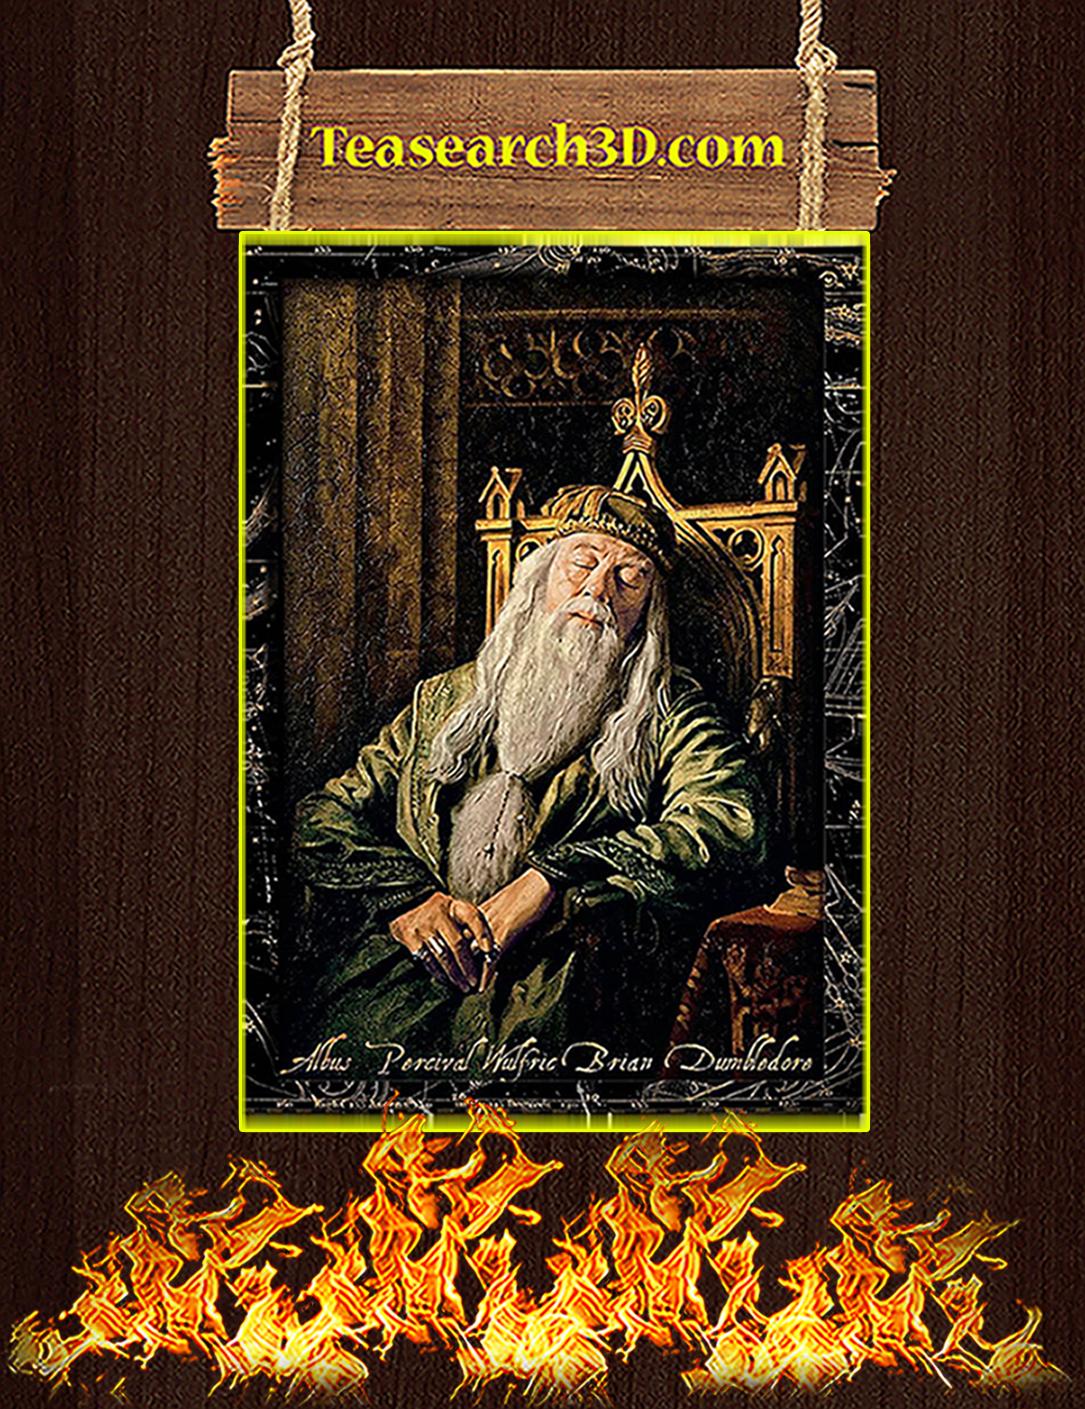 Albus percival wulfric brian dumbledore sleeping poster A2